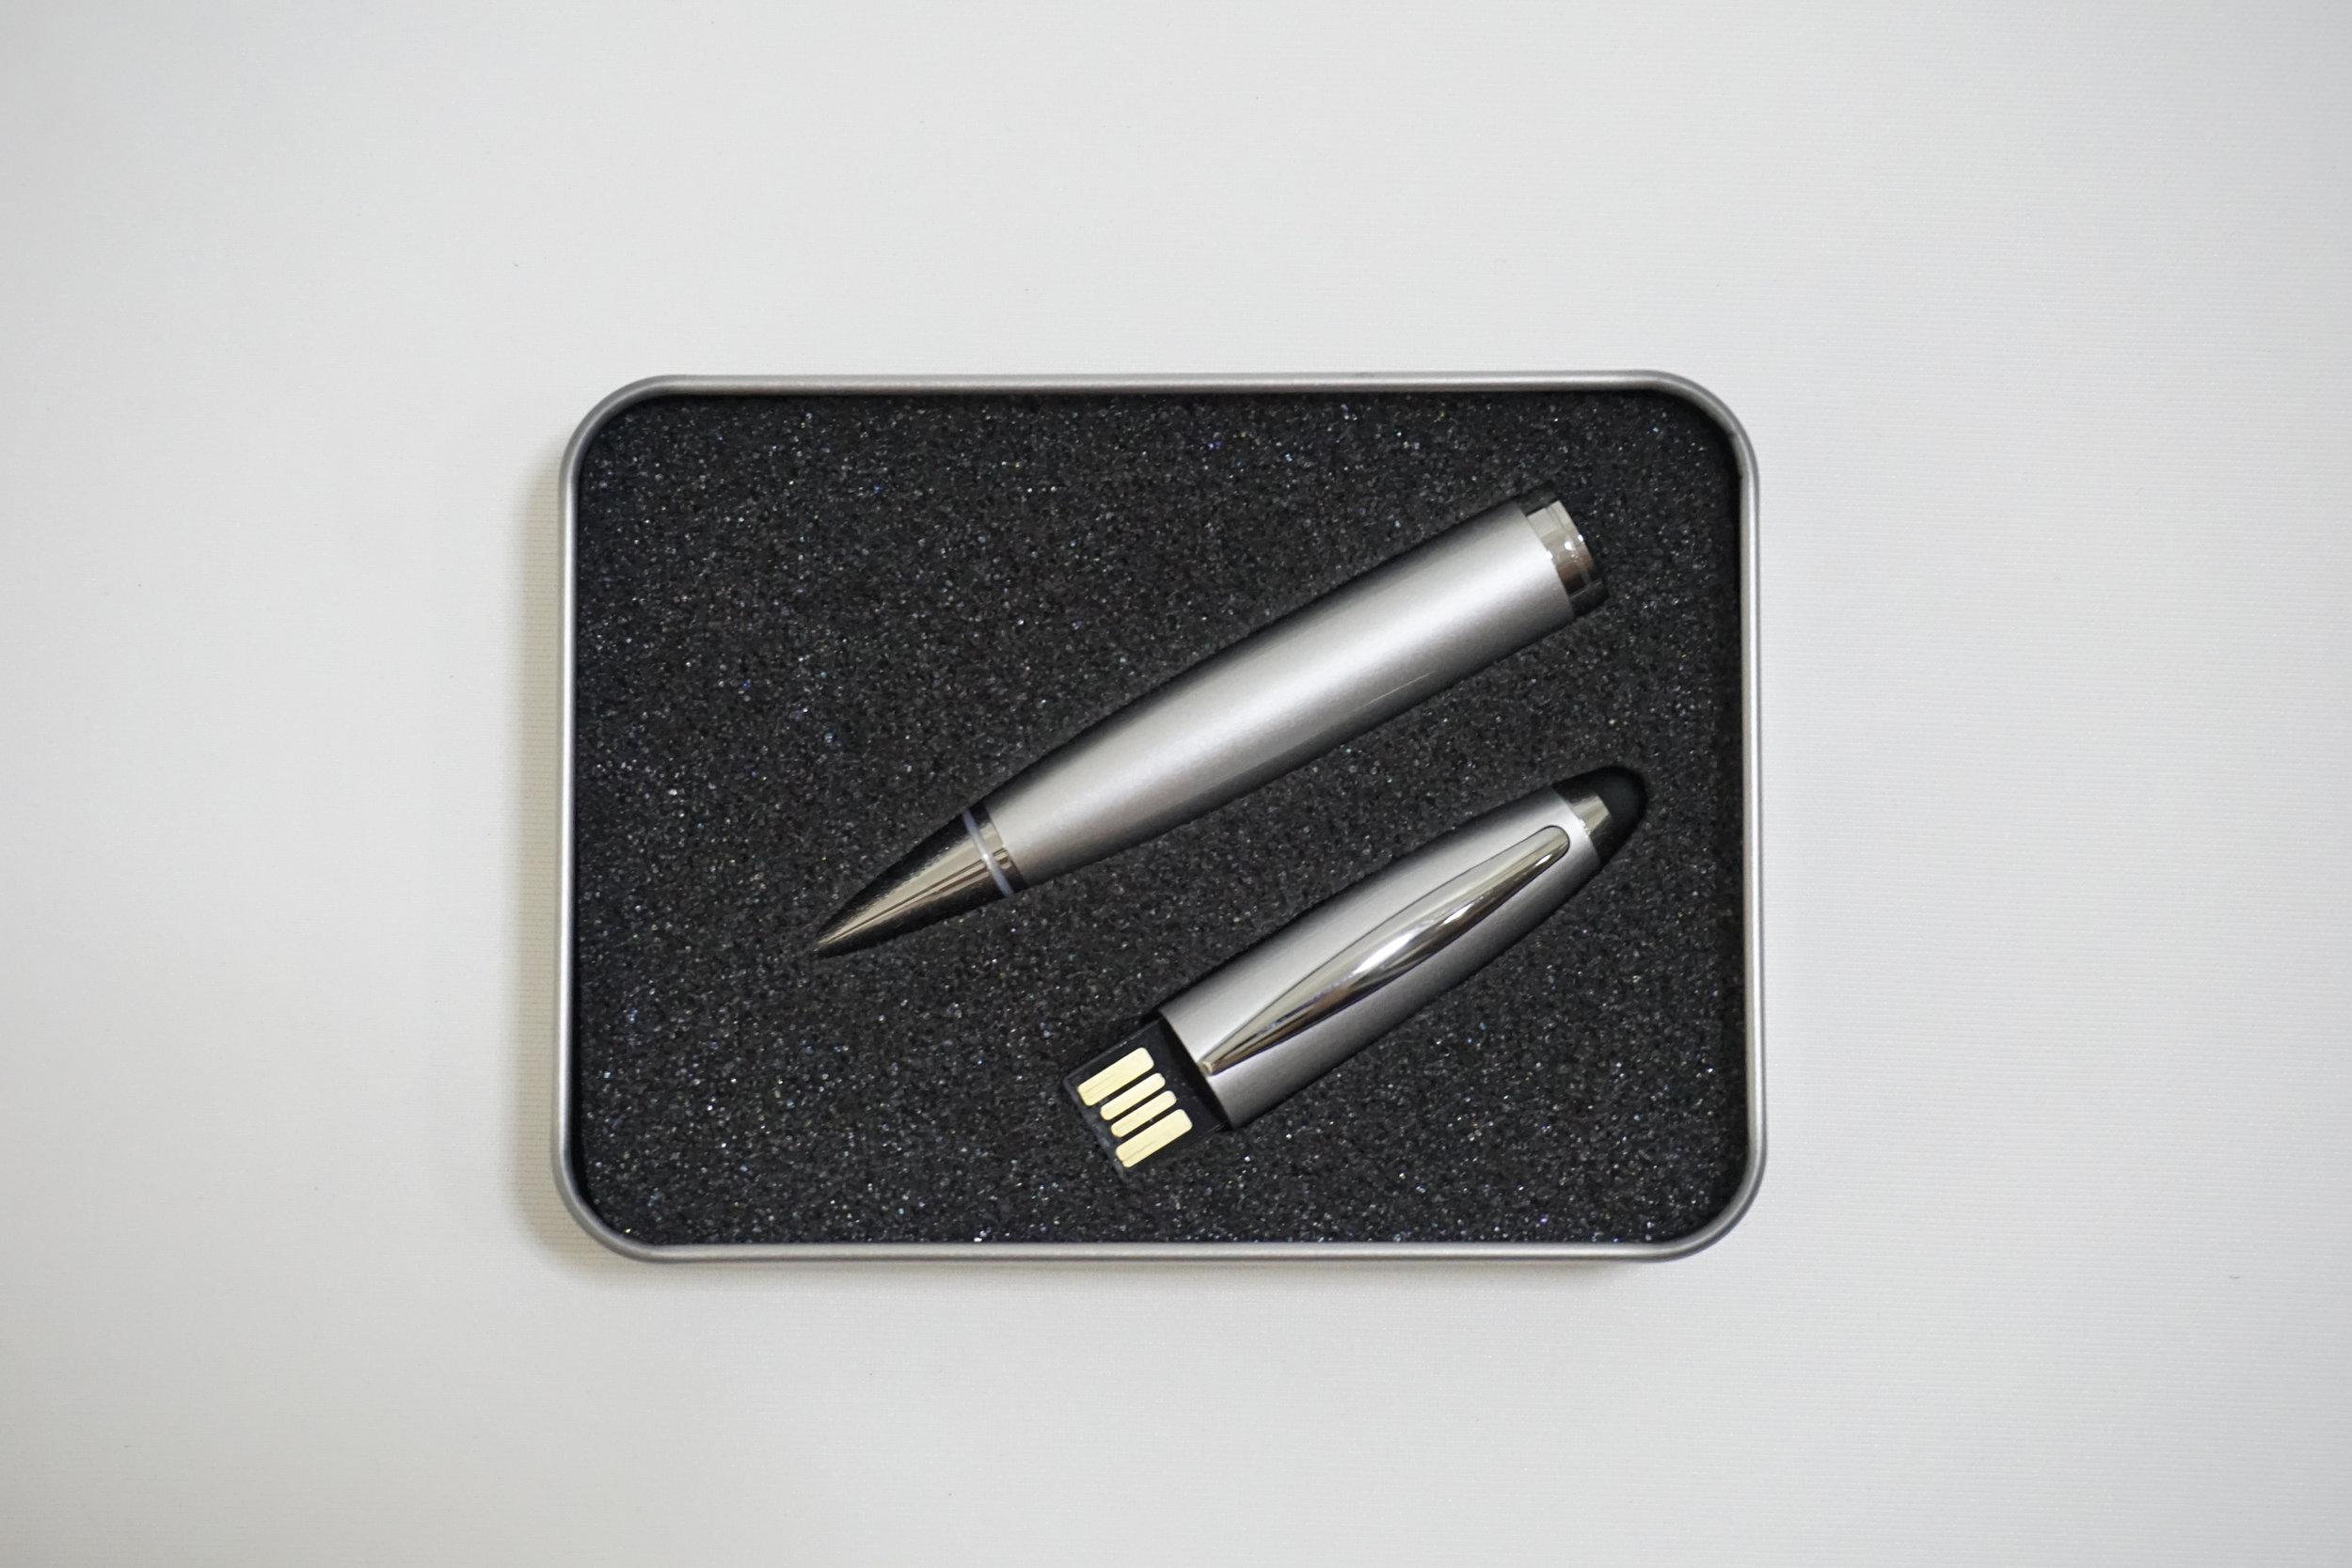 USB Pen (1).JPG